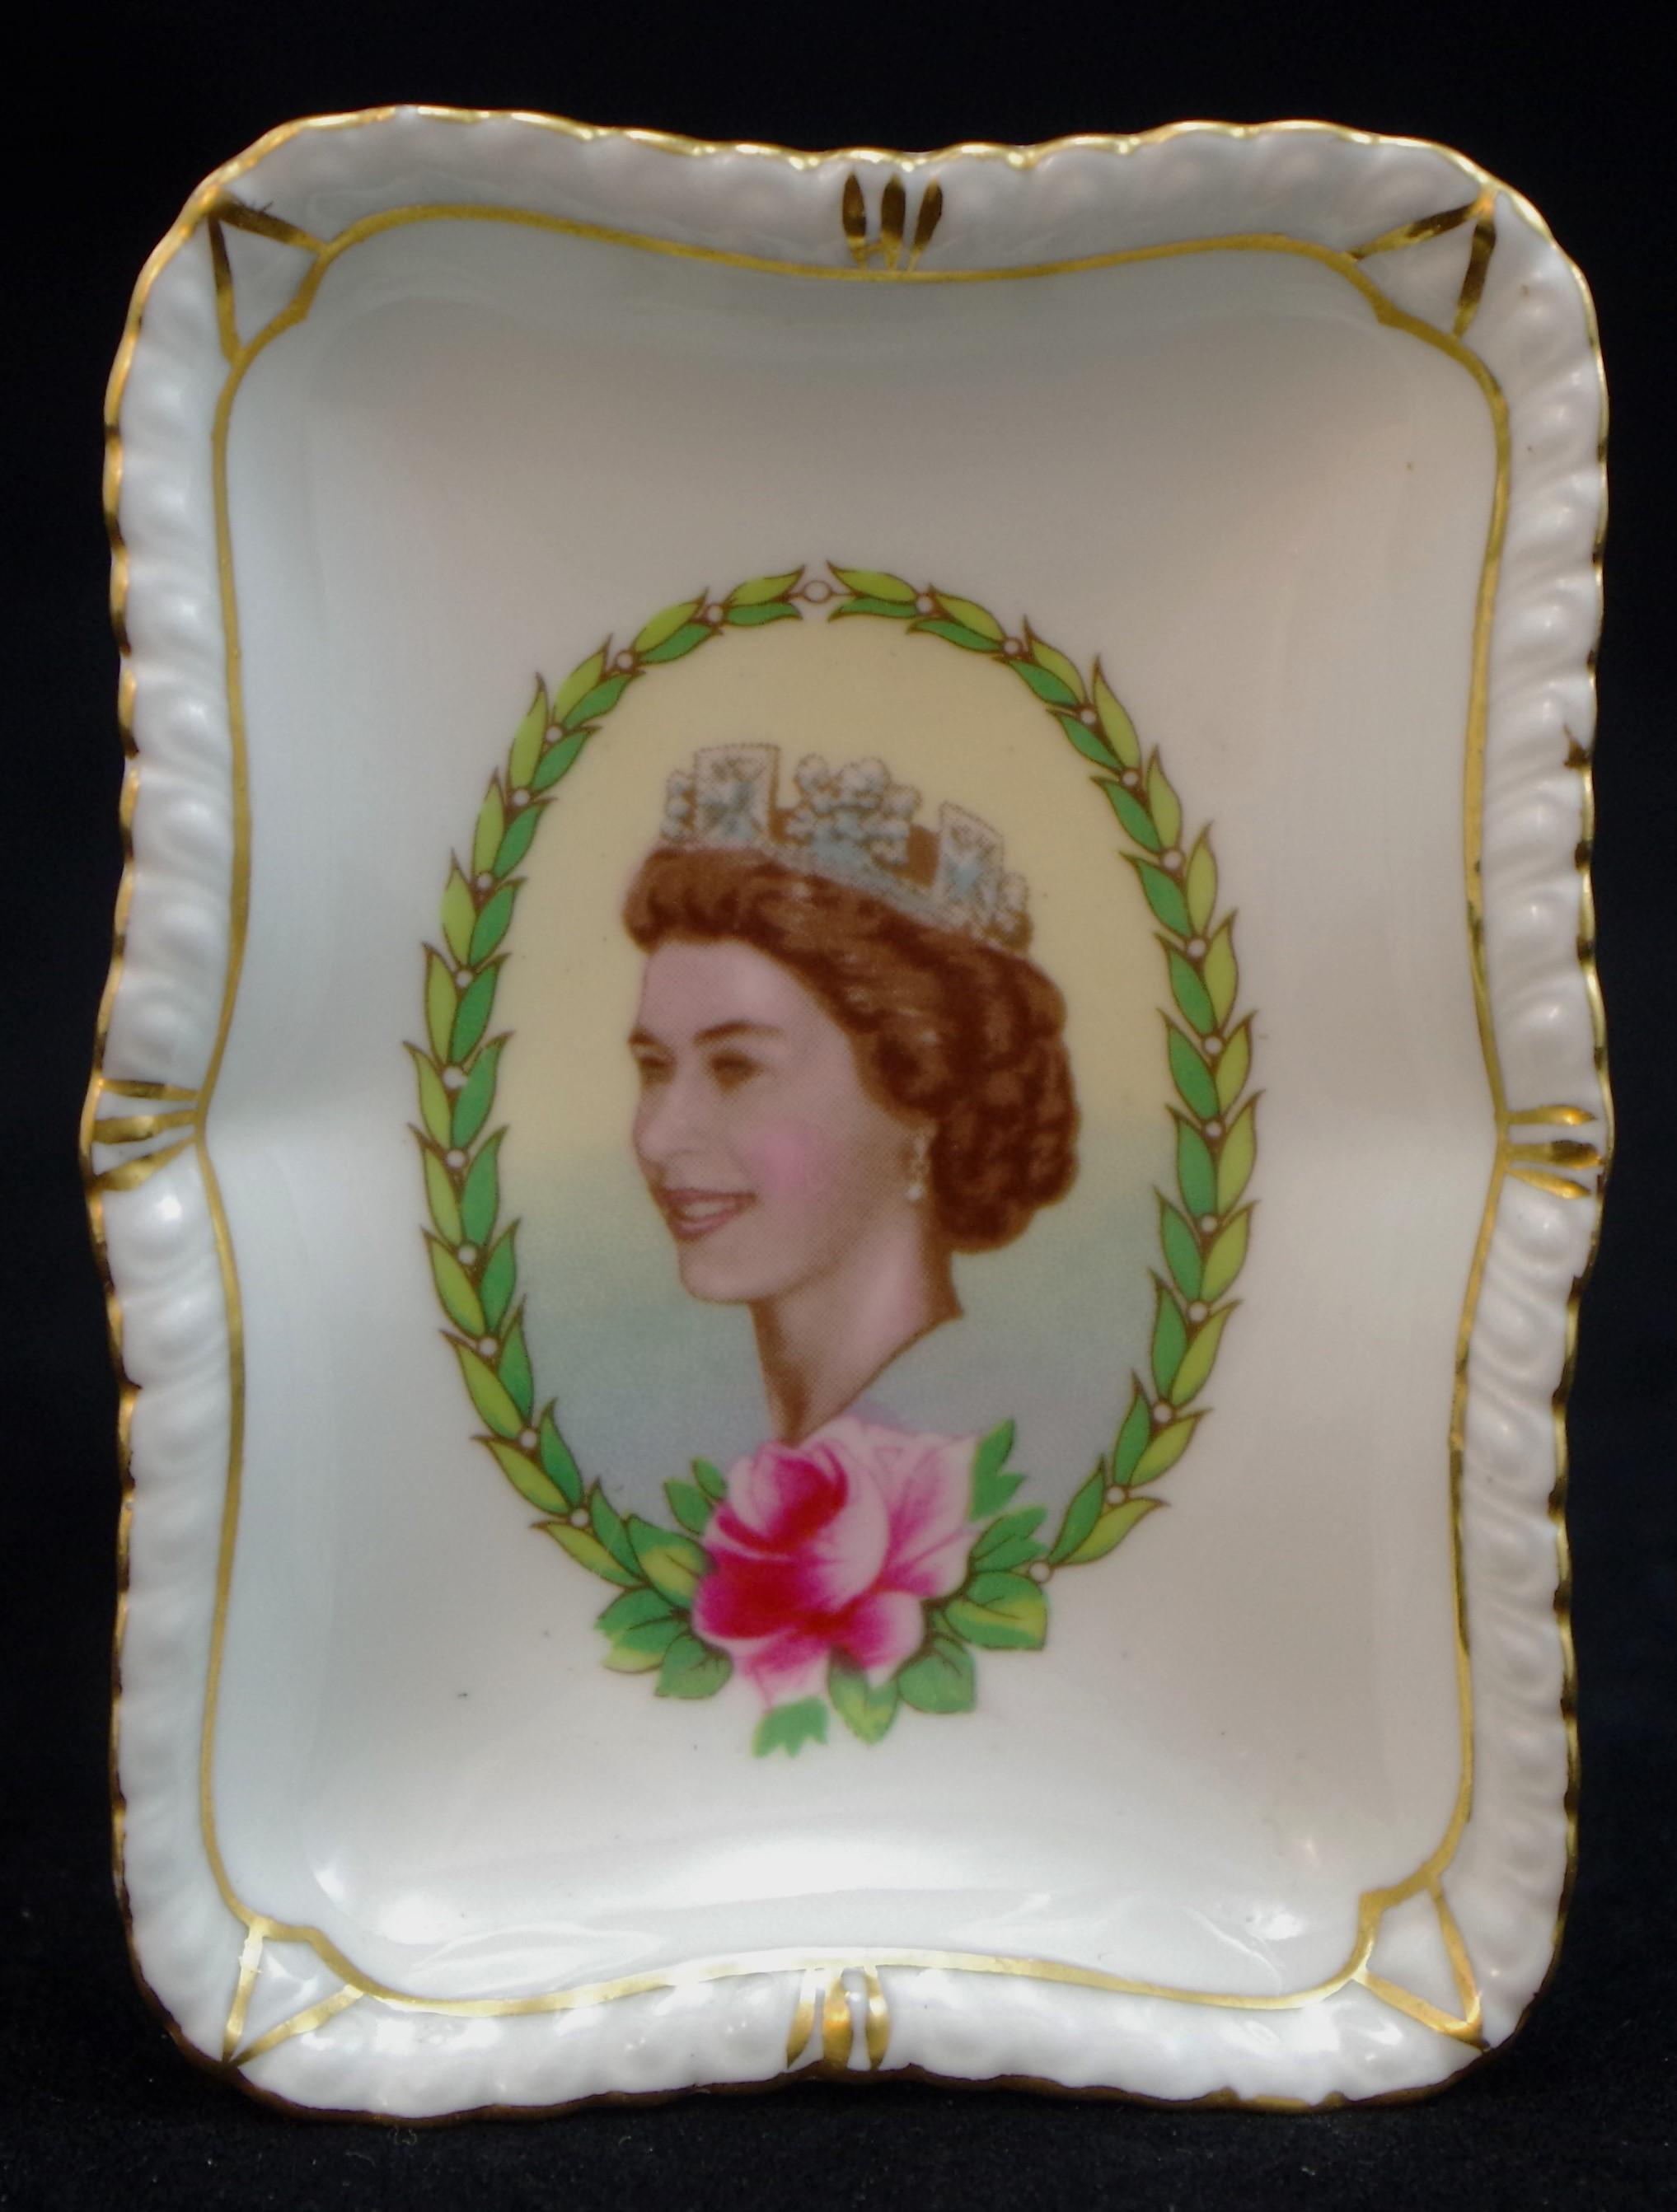 royal-crown-derby-gadroon-elizabeth-II-visit-to-canada-1957